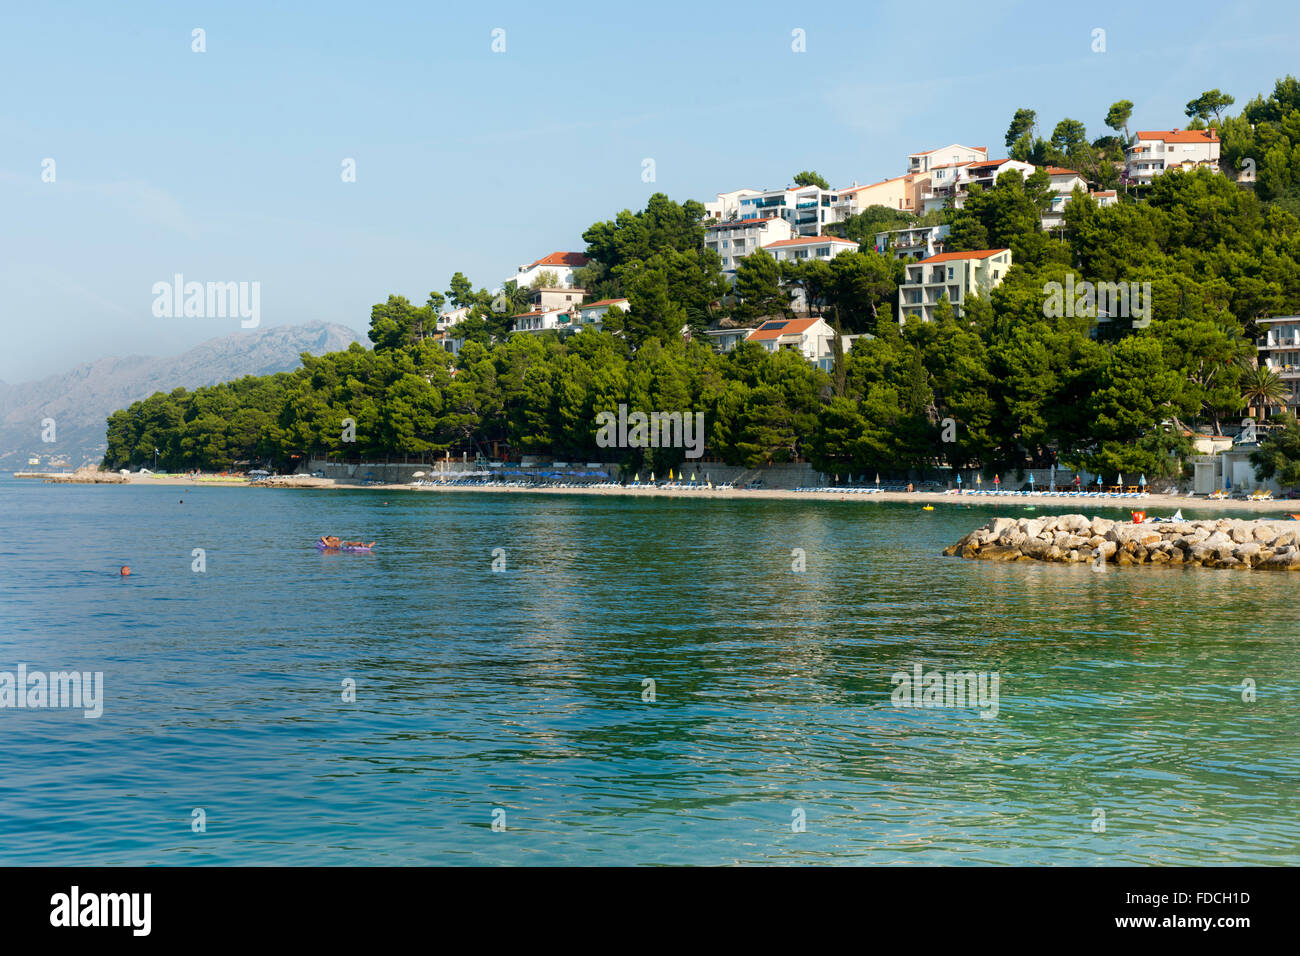 Kroatien, Dalmatien, Makarska Riviera, Strand von Baska Voda - Stock Image